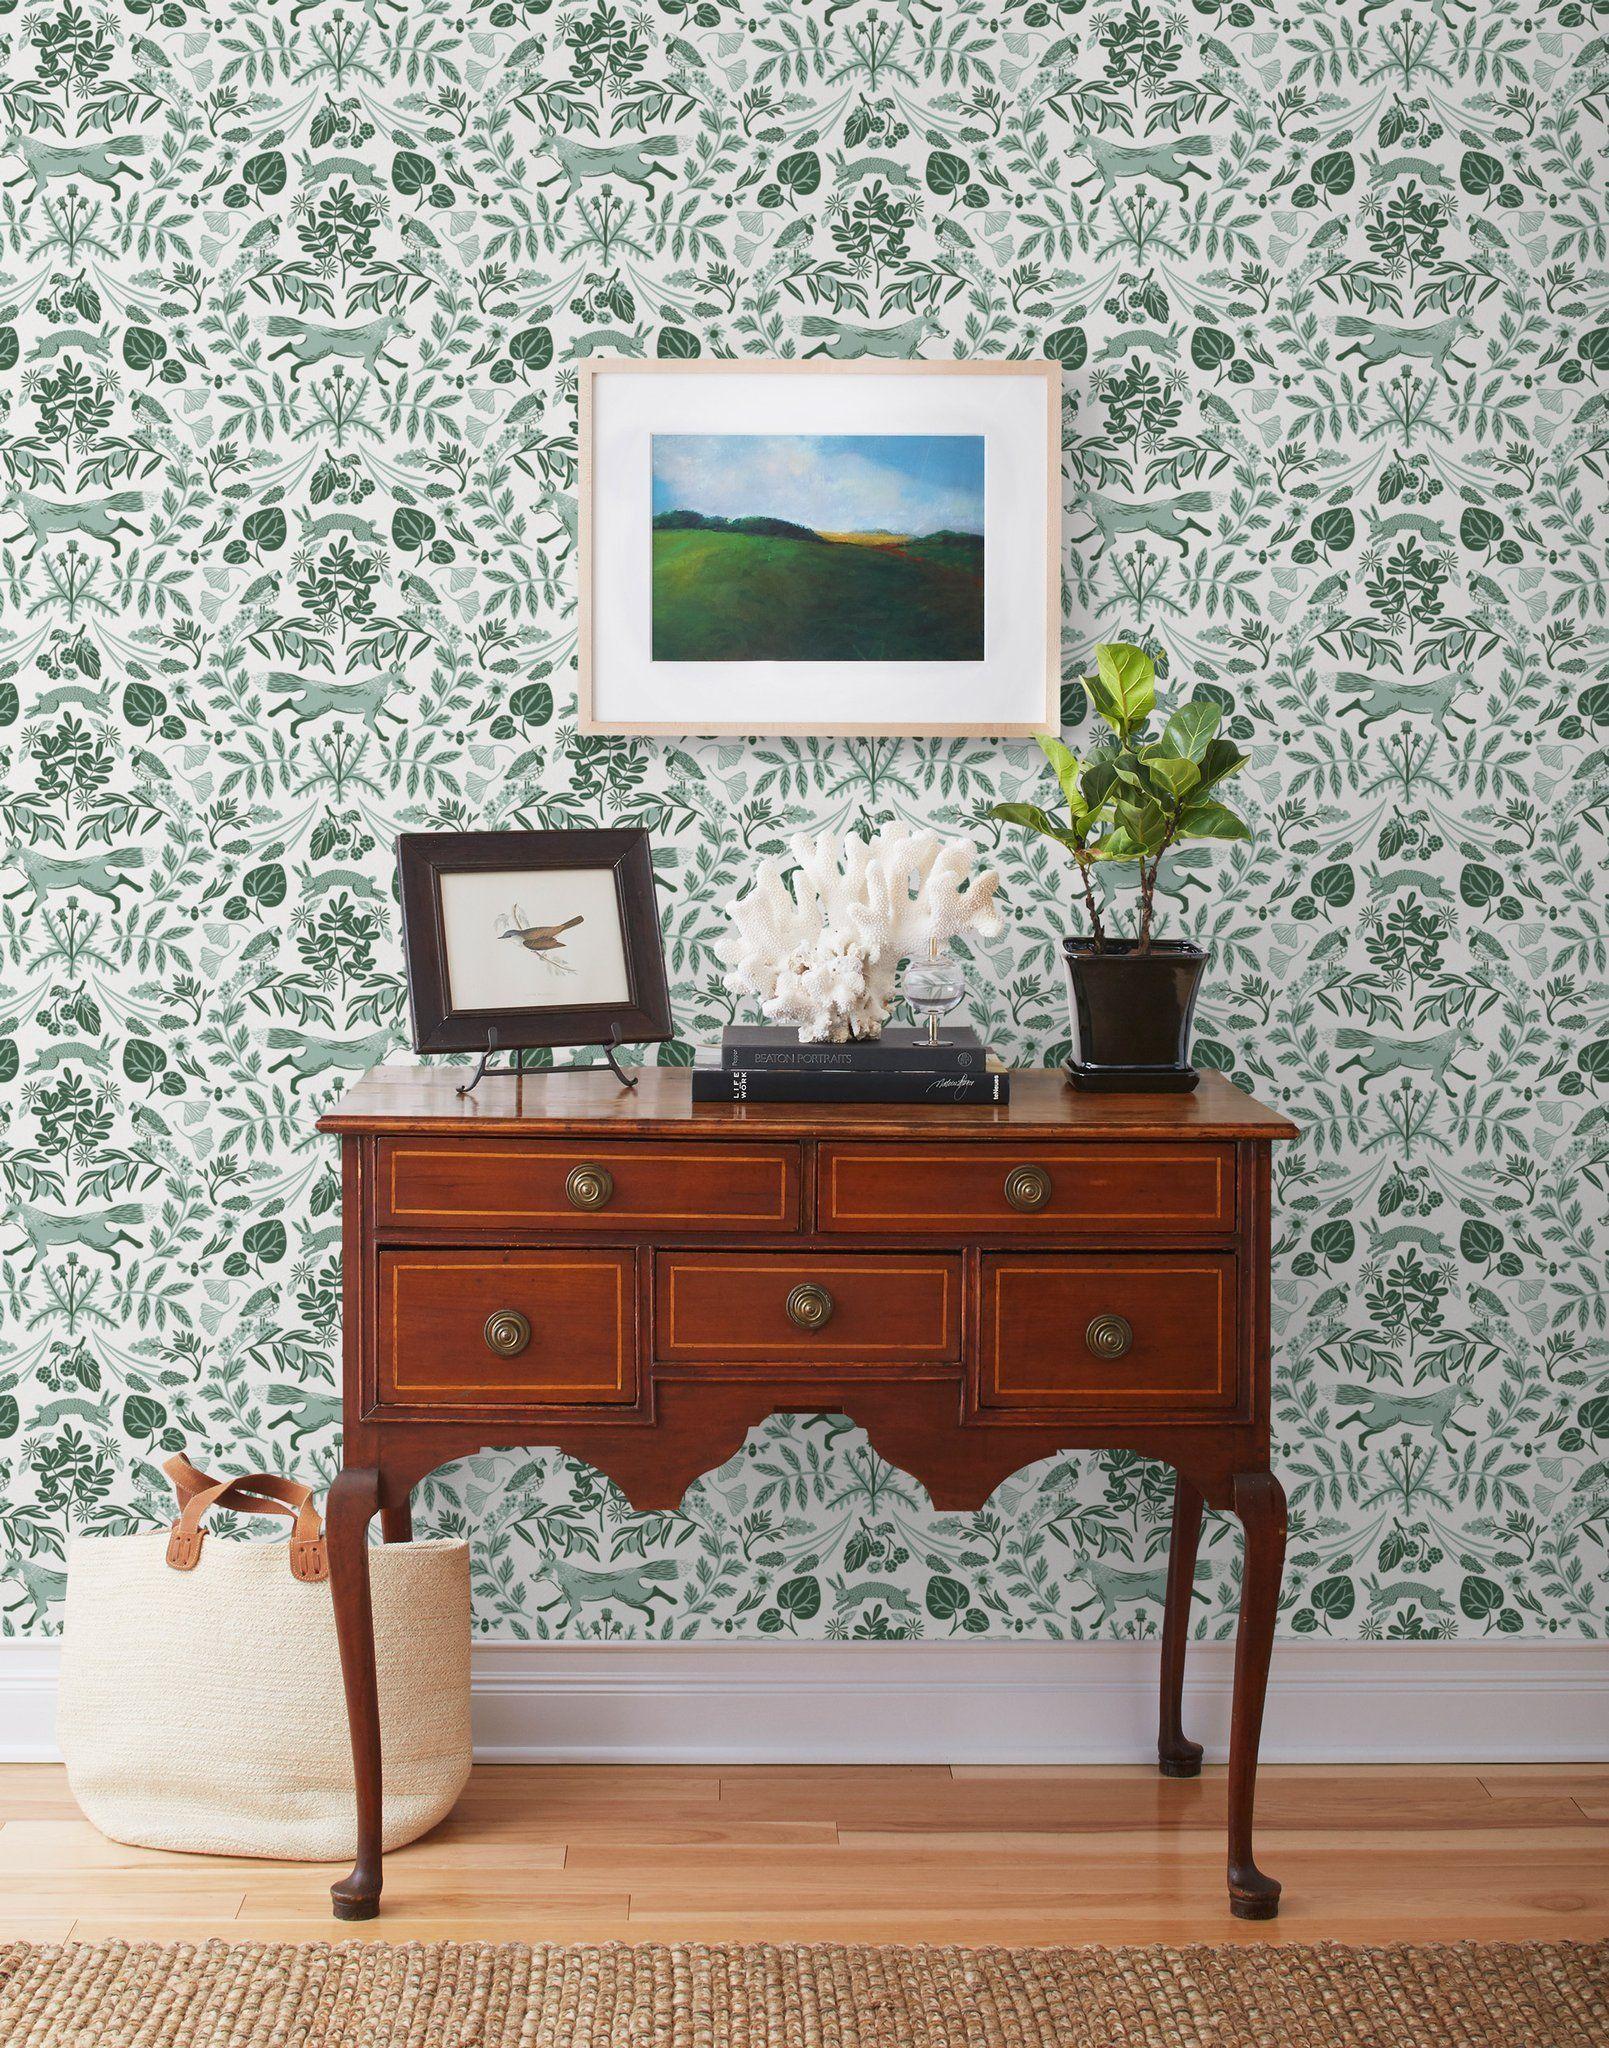 Pattern + Paint H&W Wallpapers Meet Benjamin Moore's 2020